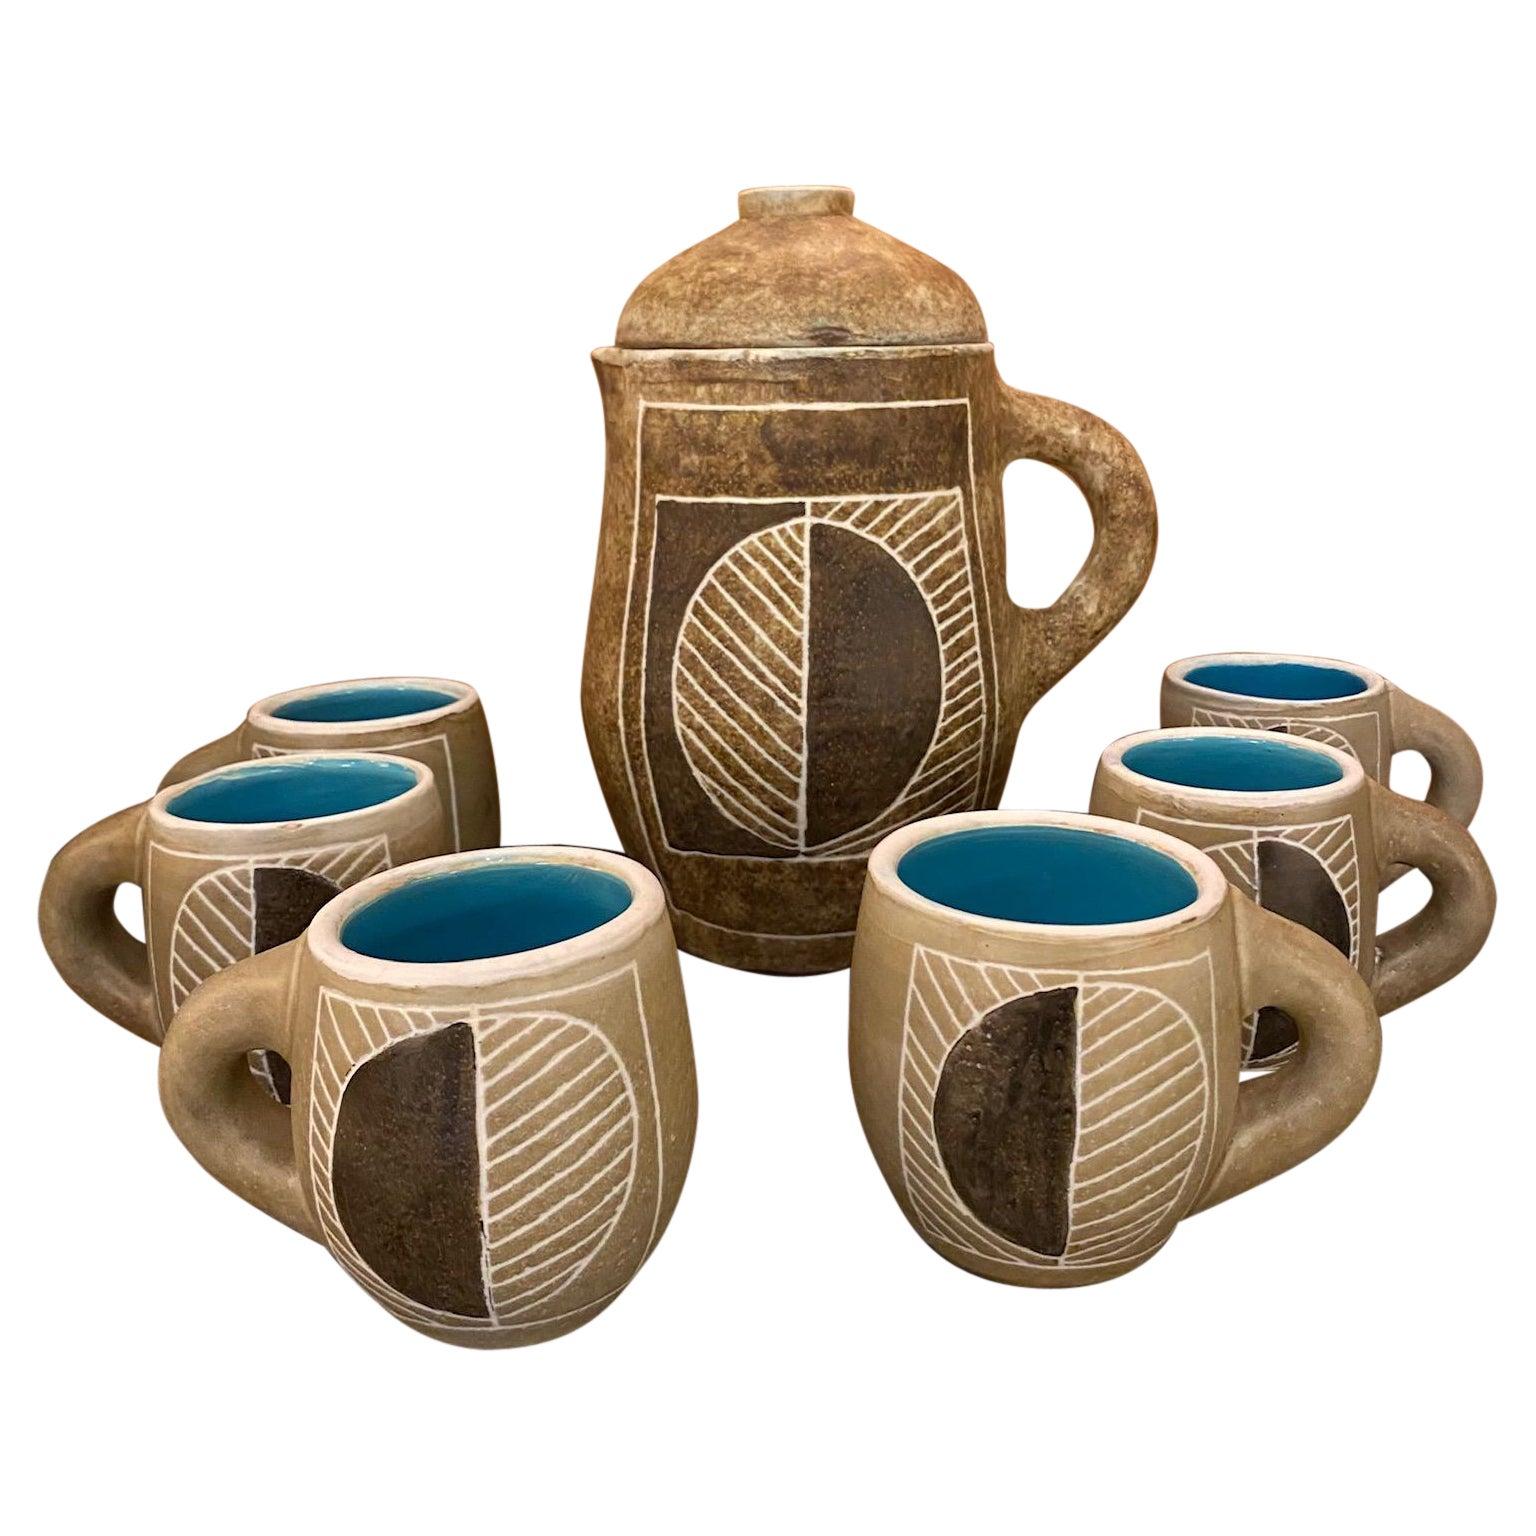 Coffee Service / Orangeade Set, Ceramic by Les 2 Potiers, France, 1960s